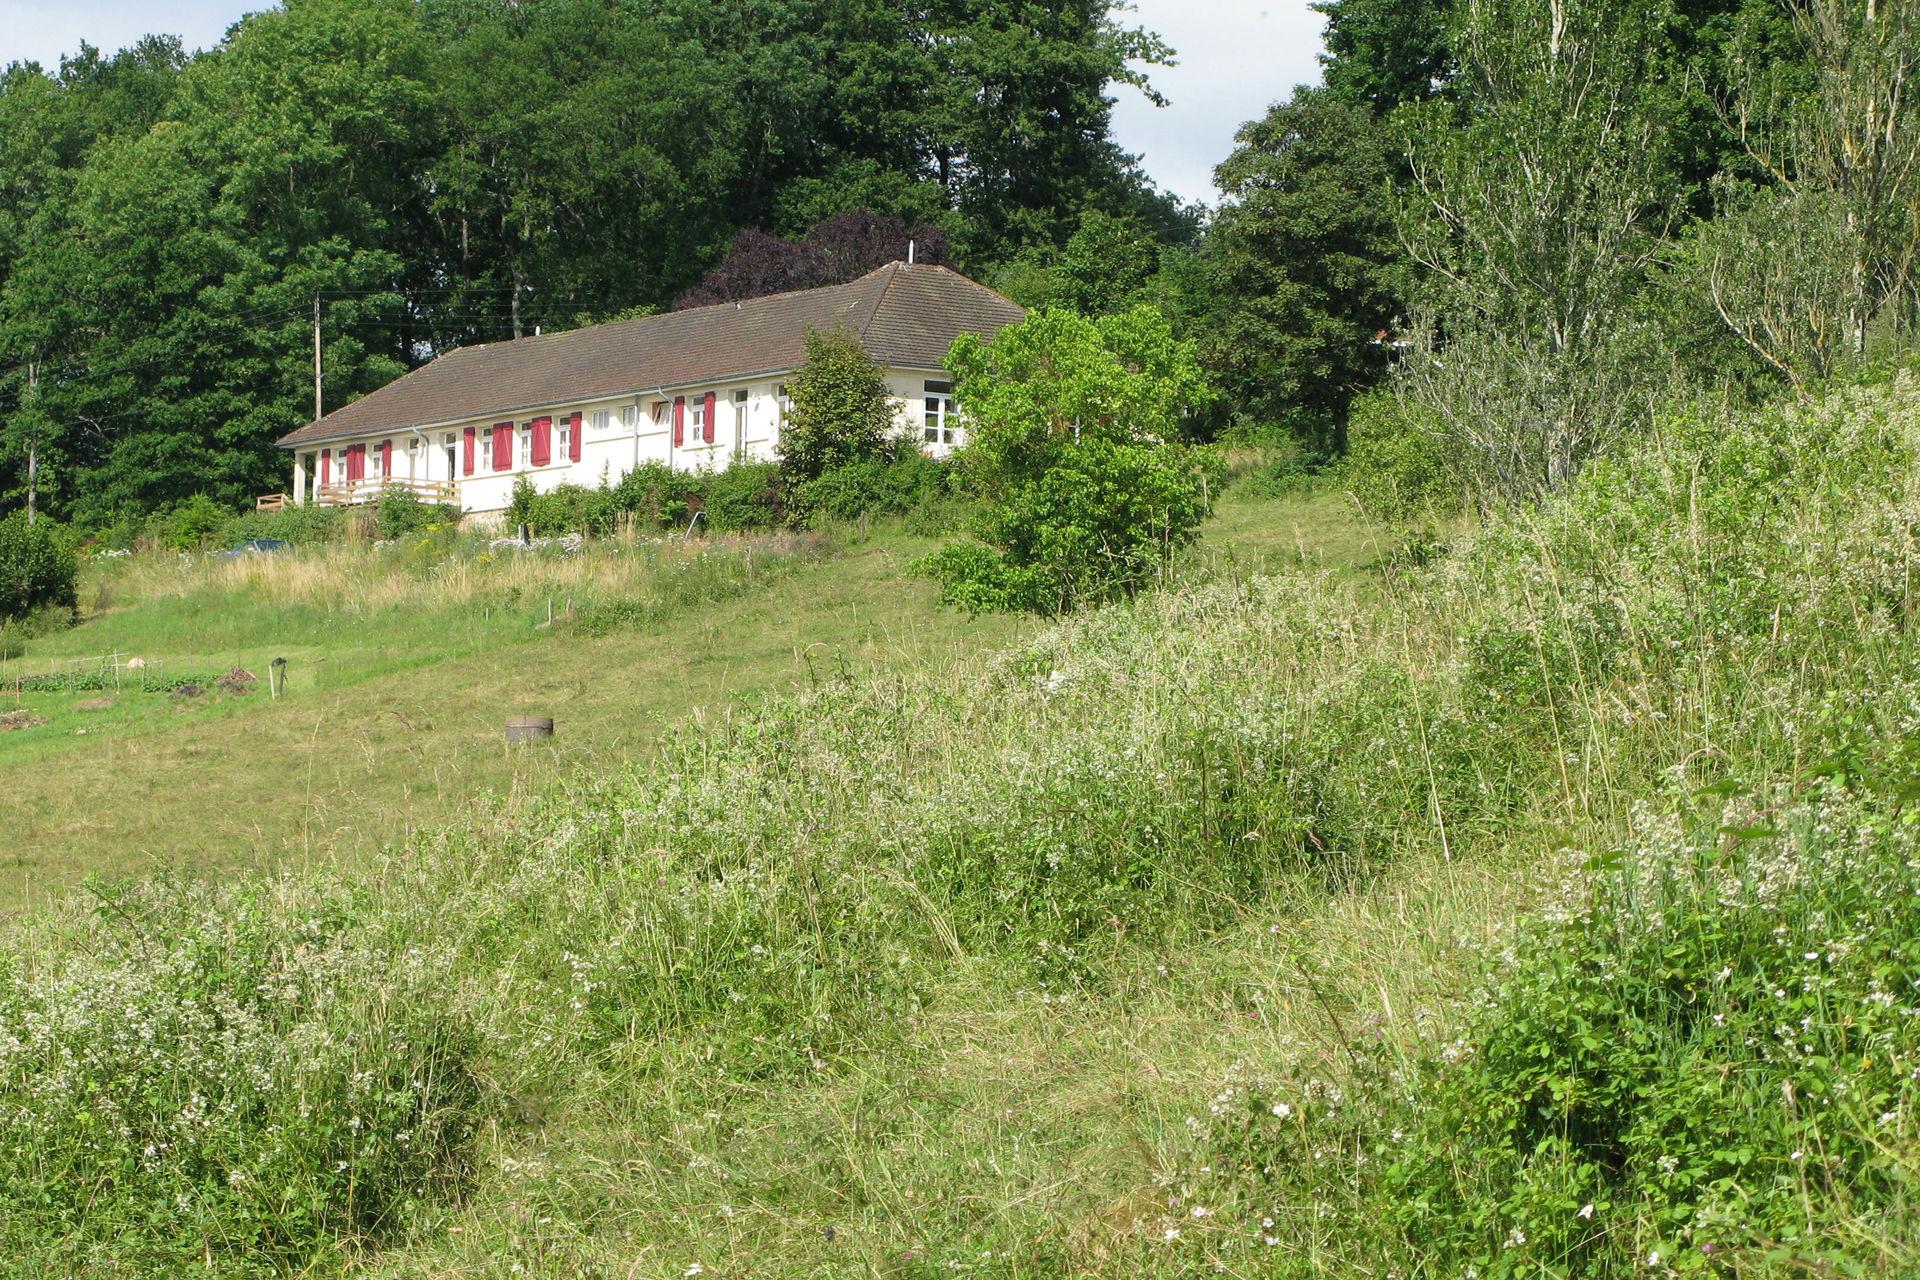 Bekijk vakantiehuis le Chardonneret / Renard in Sau00f4ne-et-Loire ...